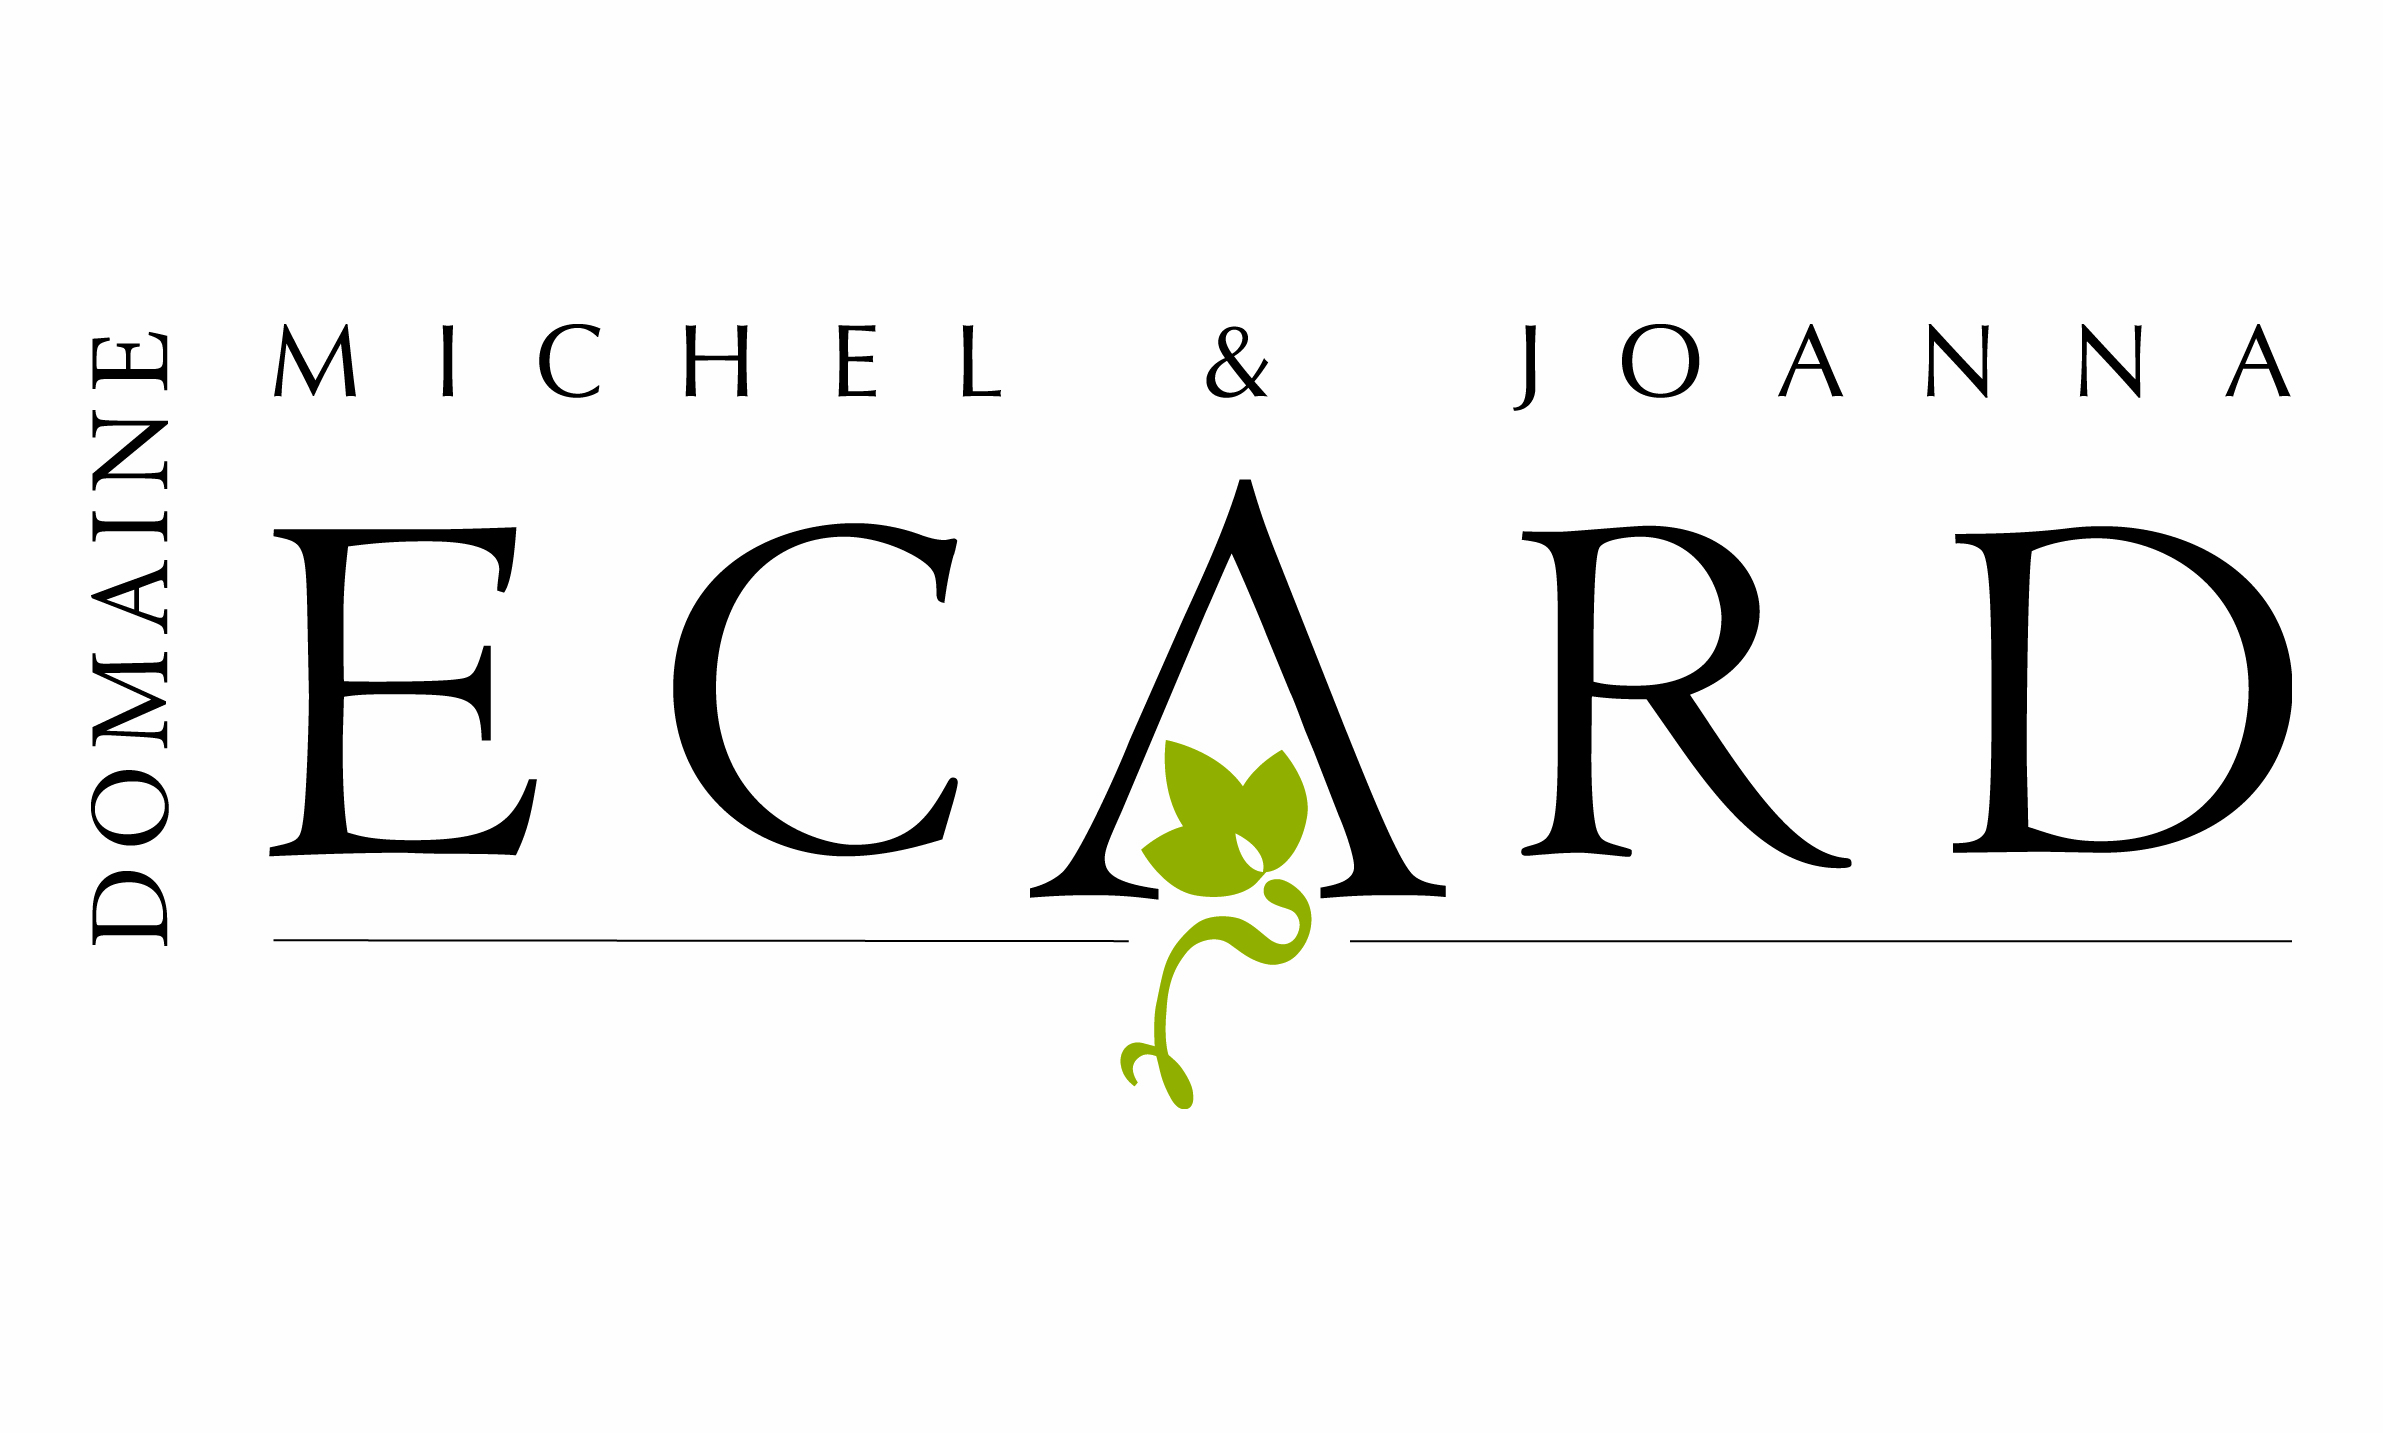 Domaine Michel et Joanna Ecard